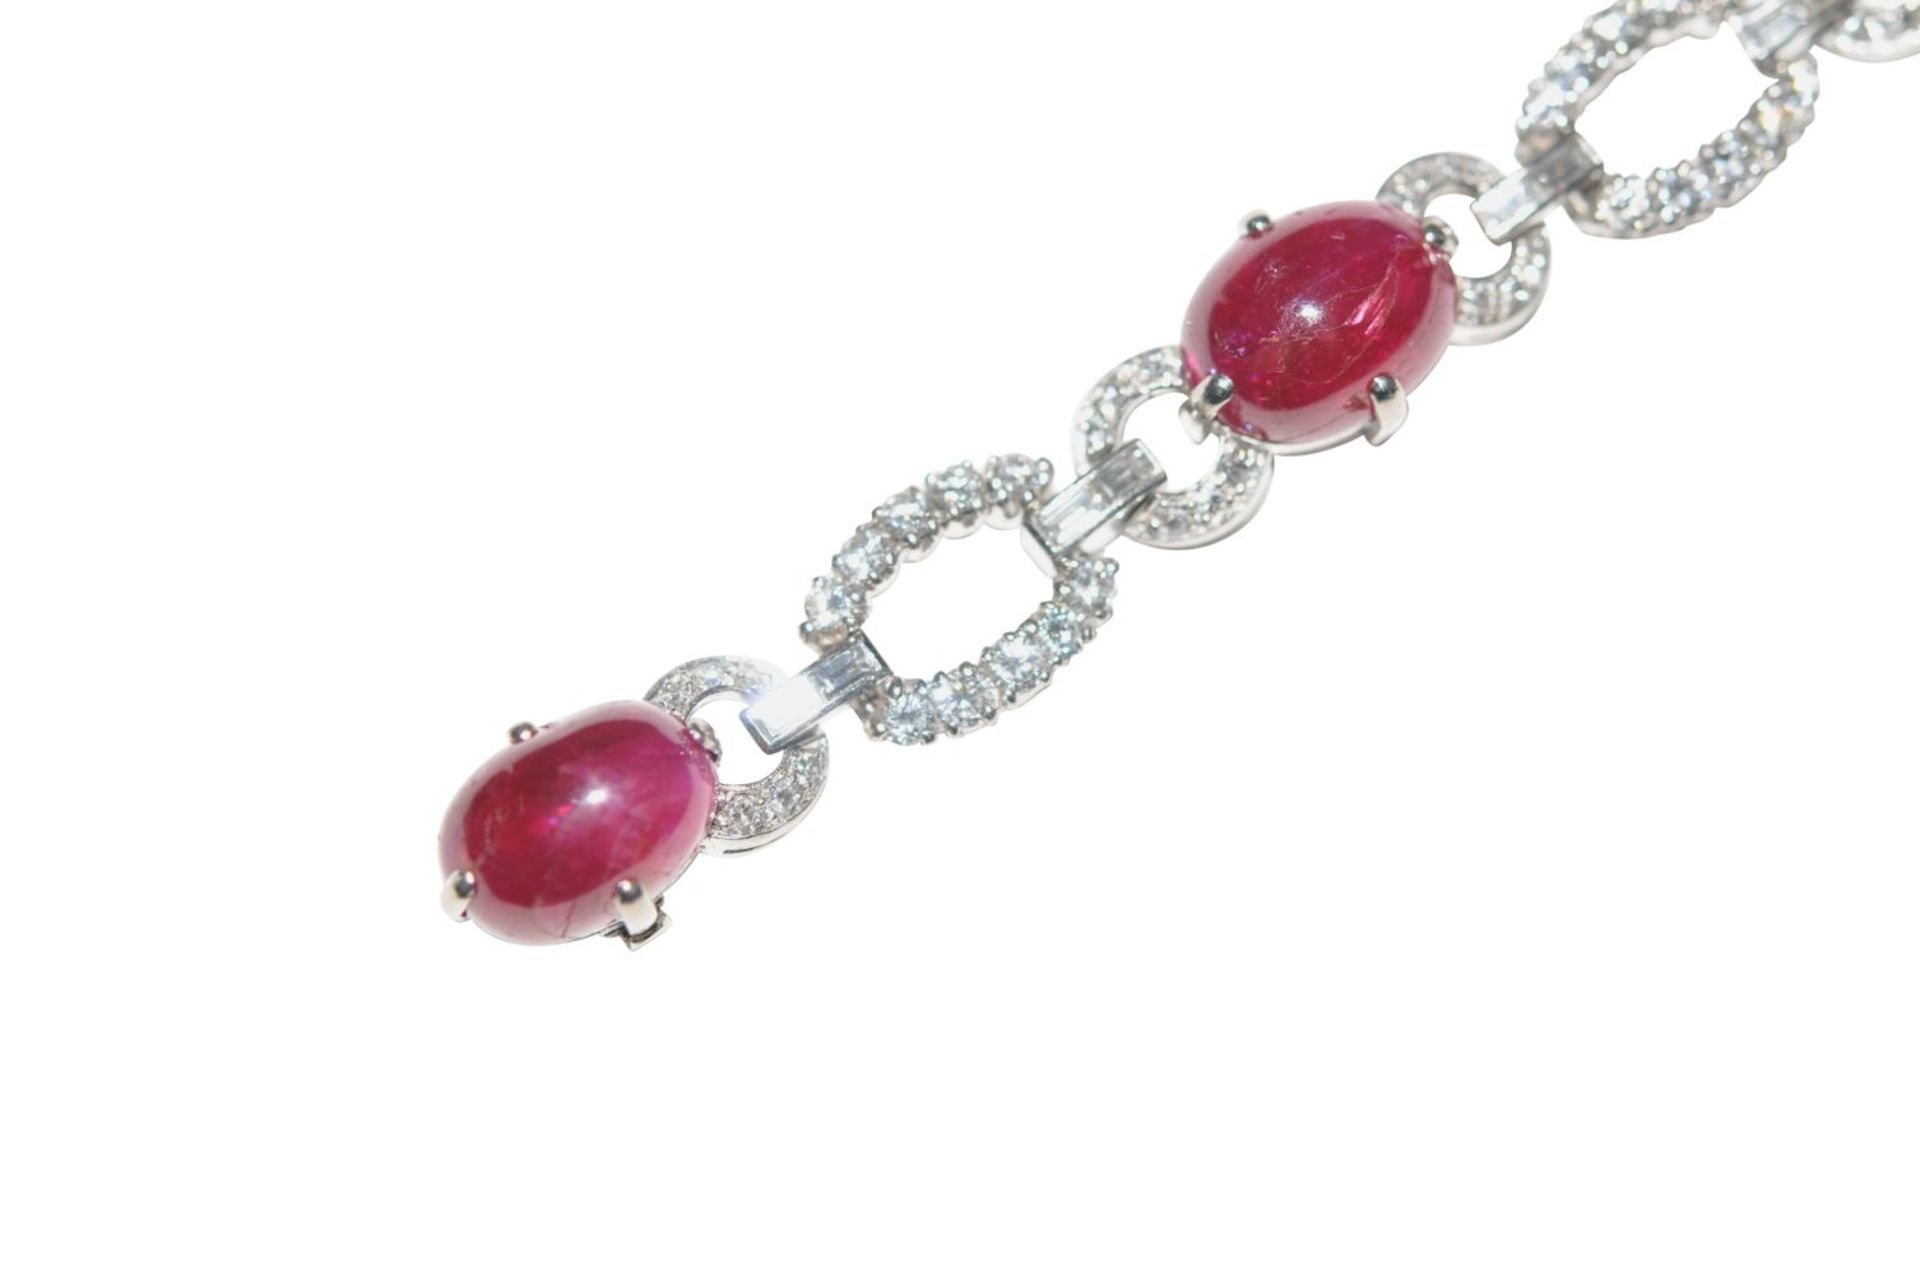 Los 116 - Platinum-brilliant-ruby braceletBracelet, partly Pt 950/000 and 18kt white gold with diamonds